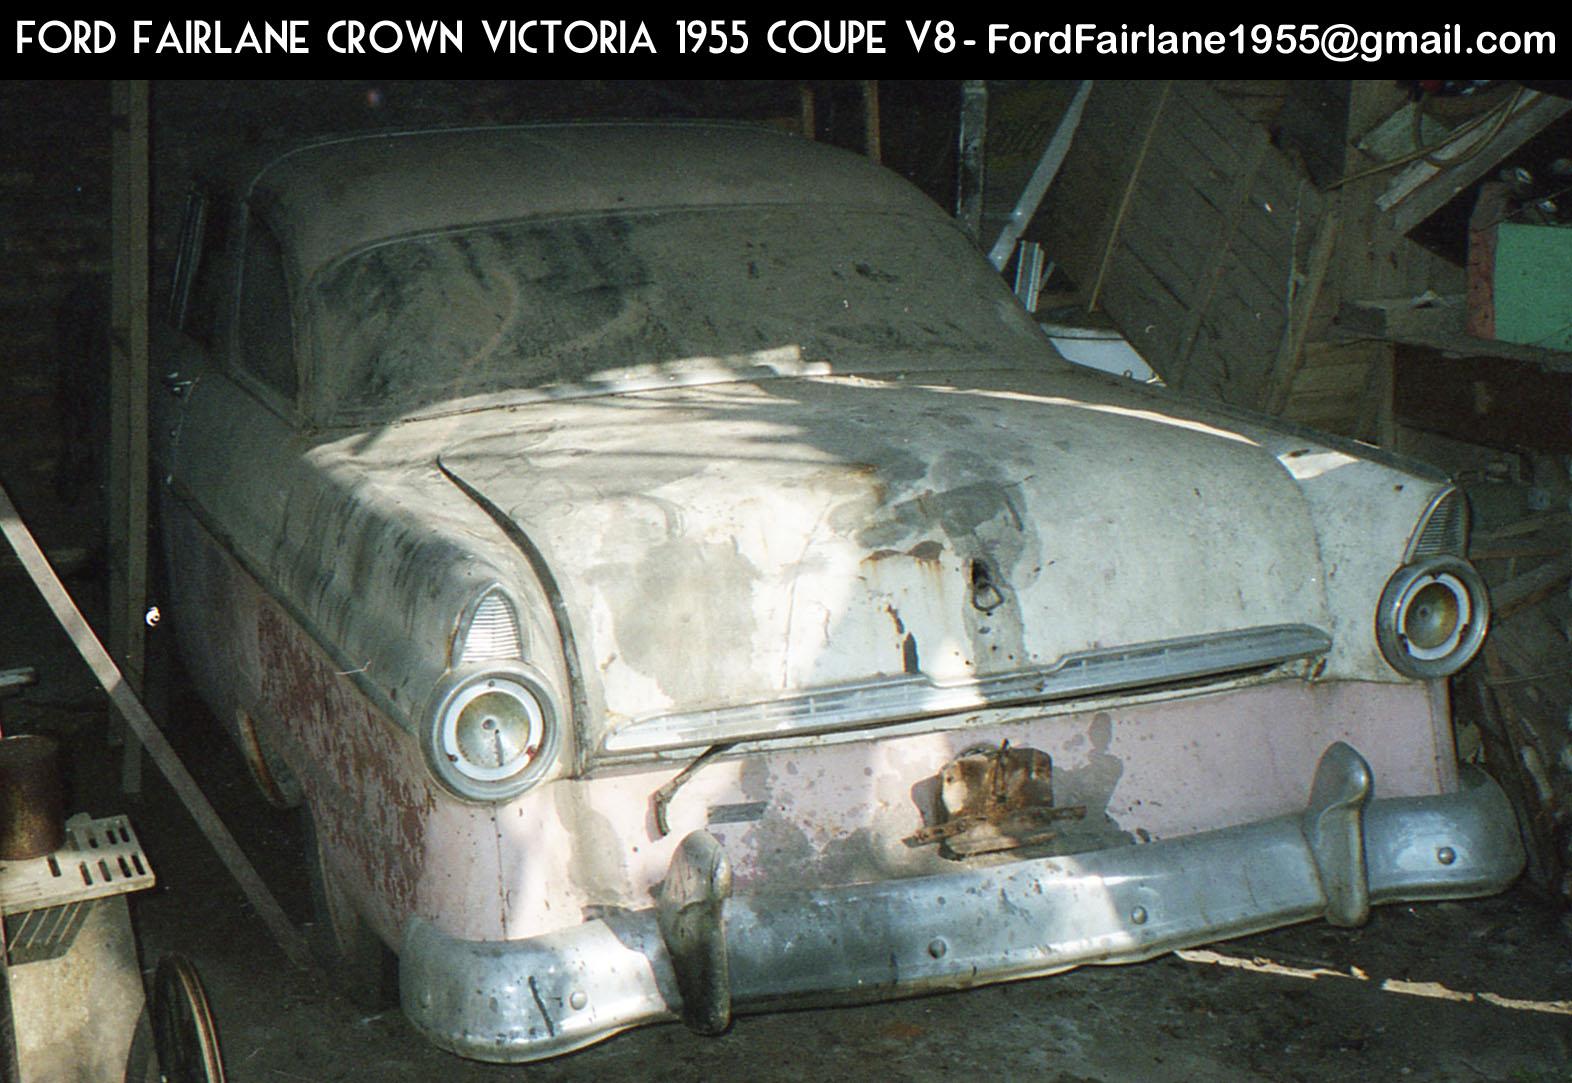 Ford Fairlane Crown Victoria 1955 V8 Coupé